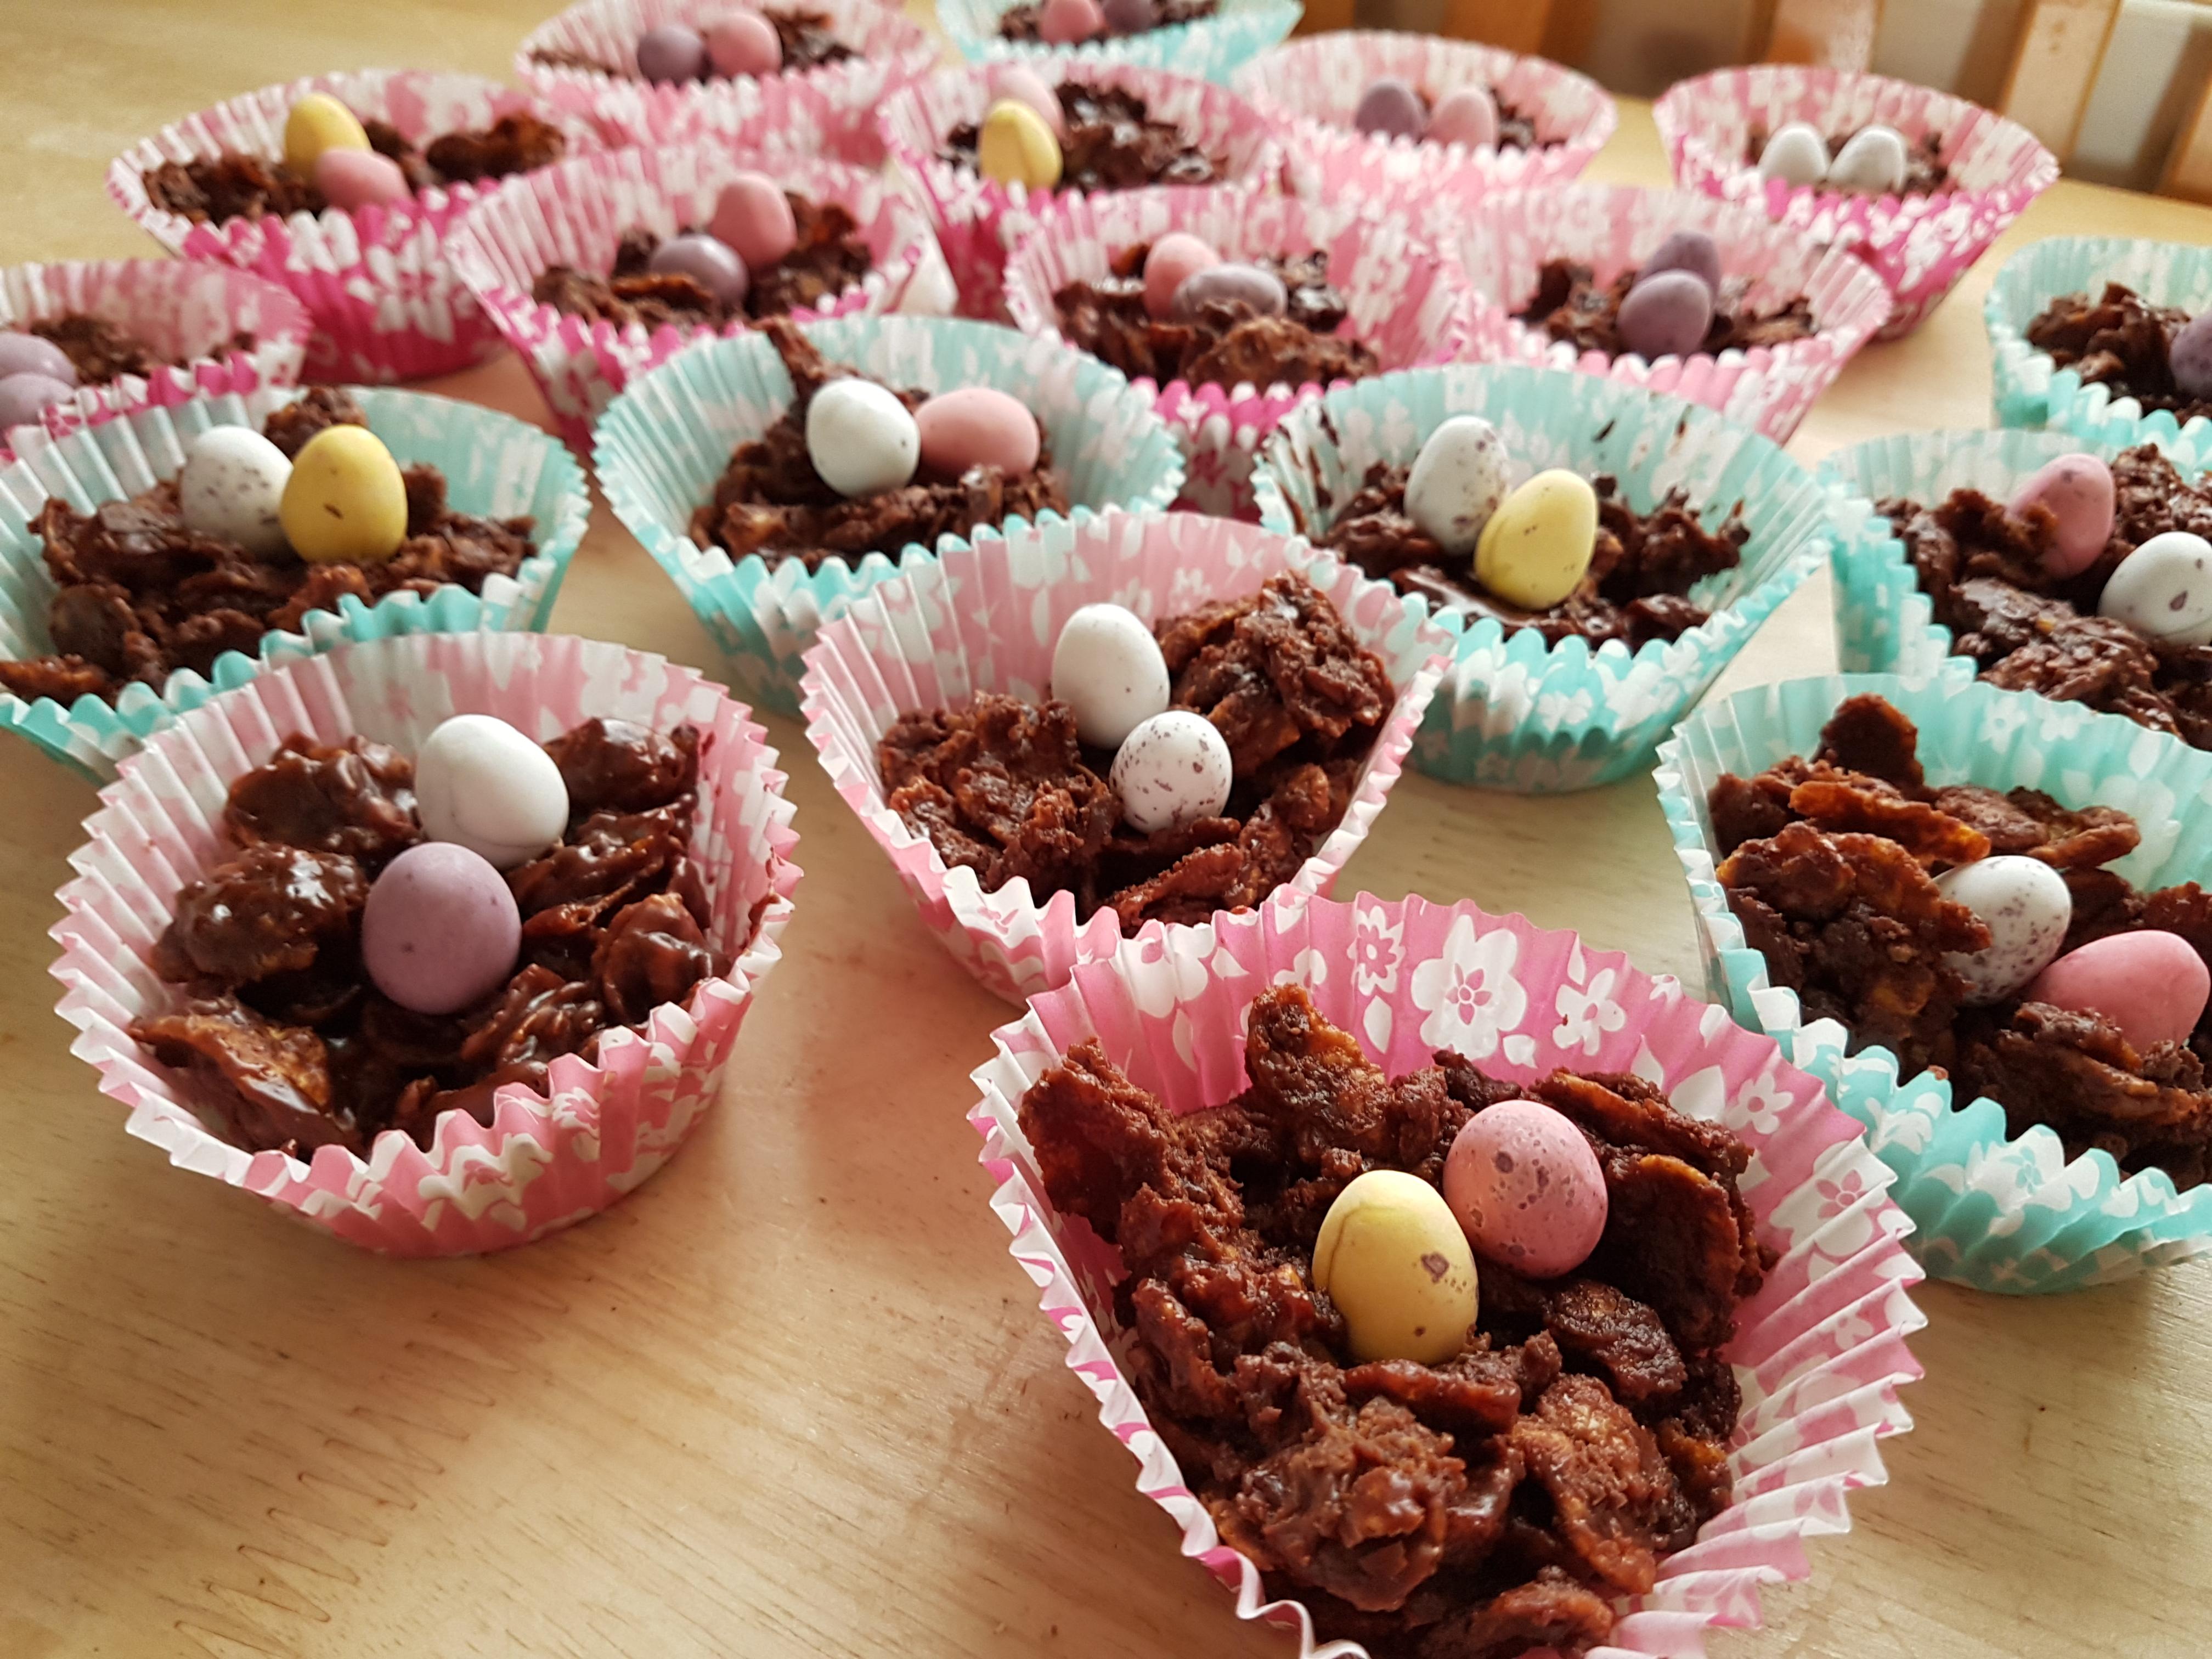 Chocolate crispy nest cakes